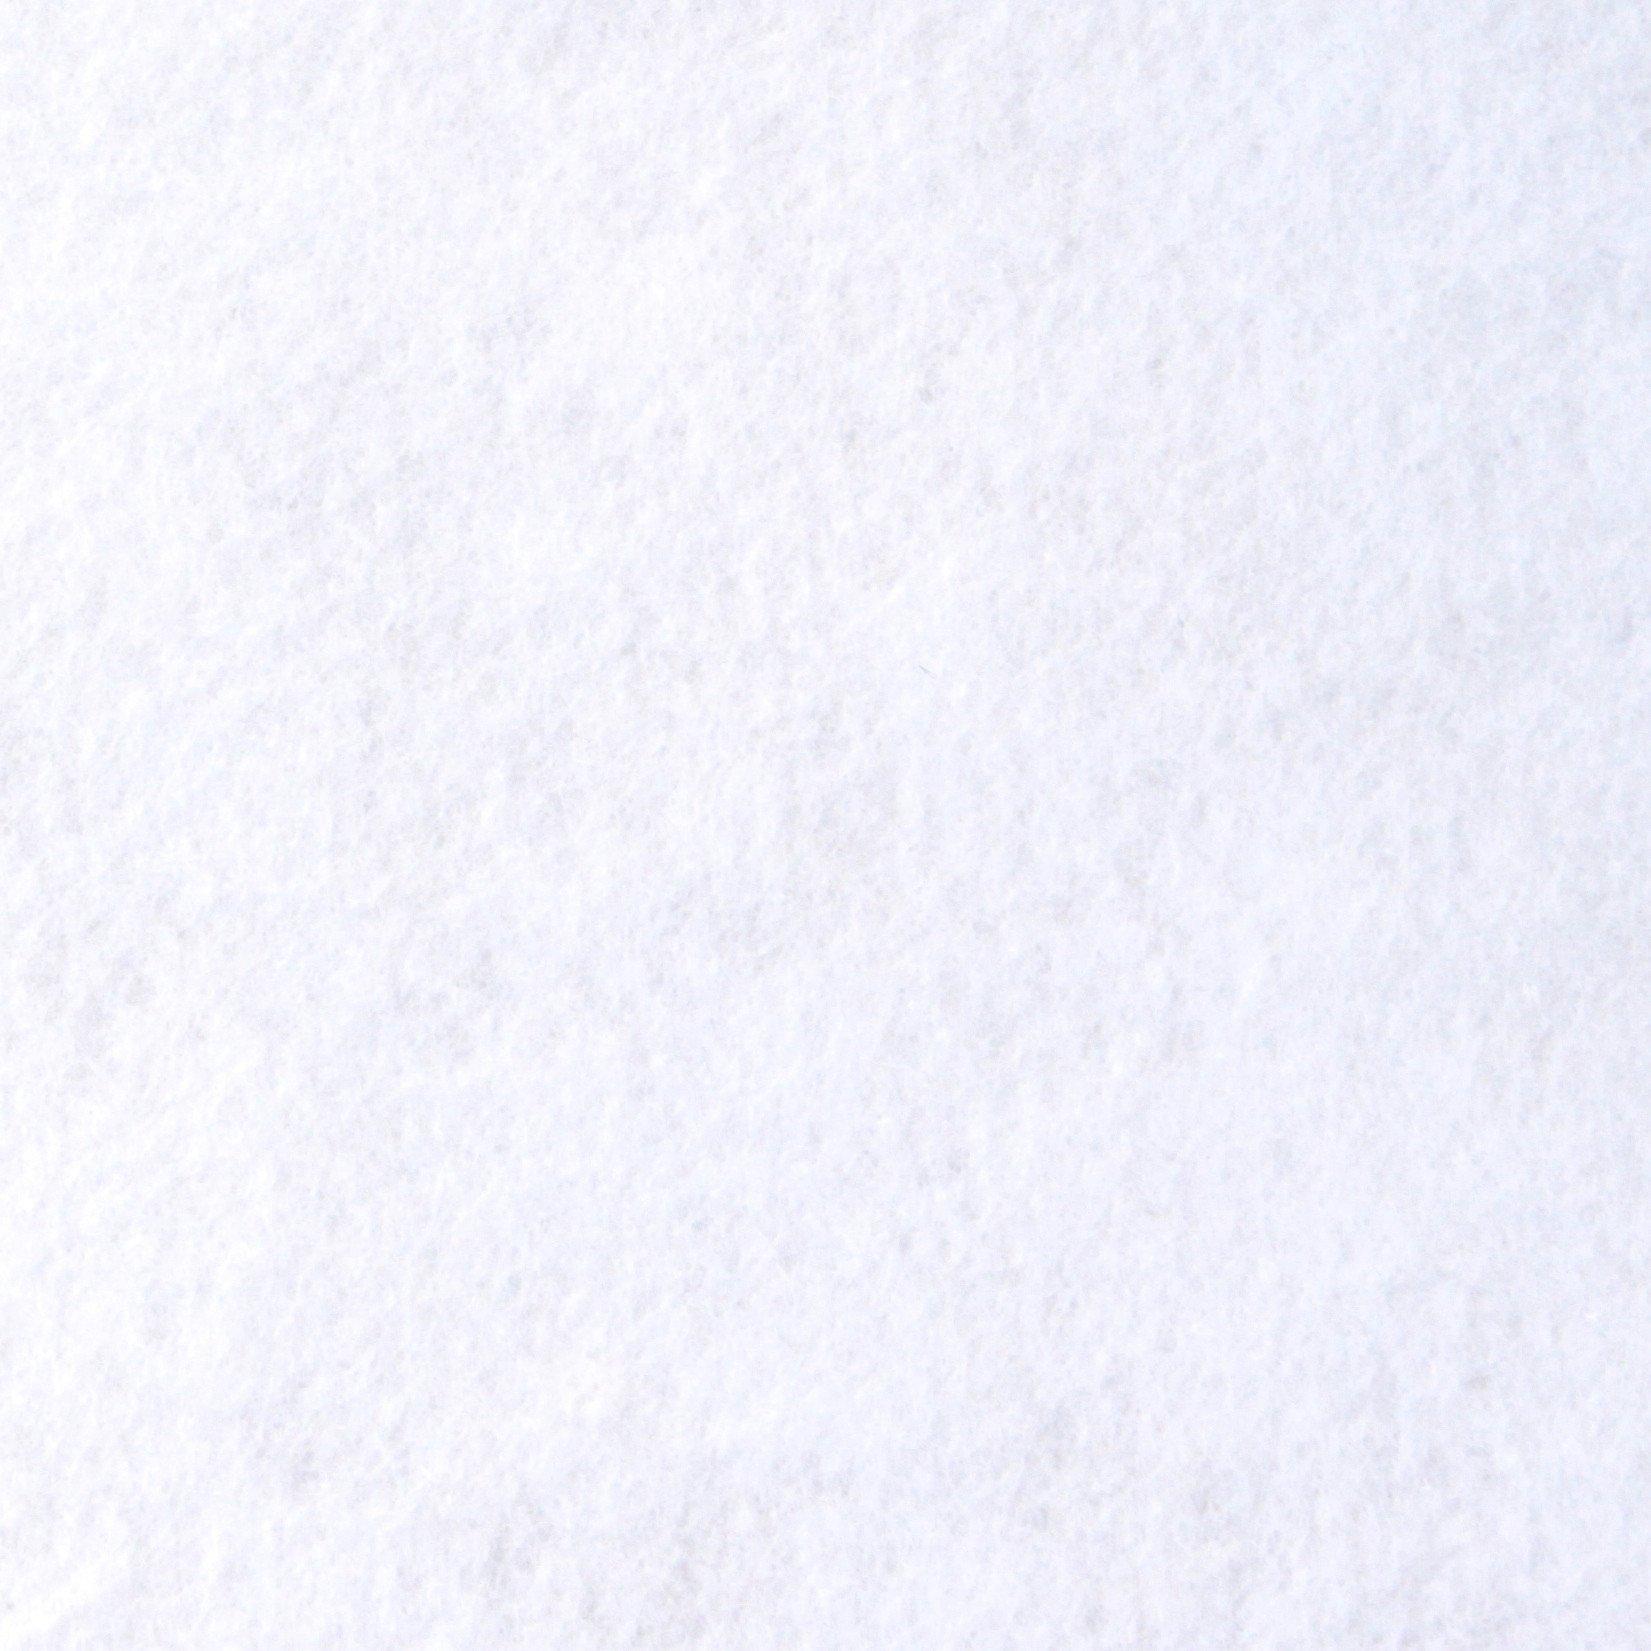 white-felt-background